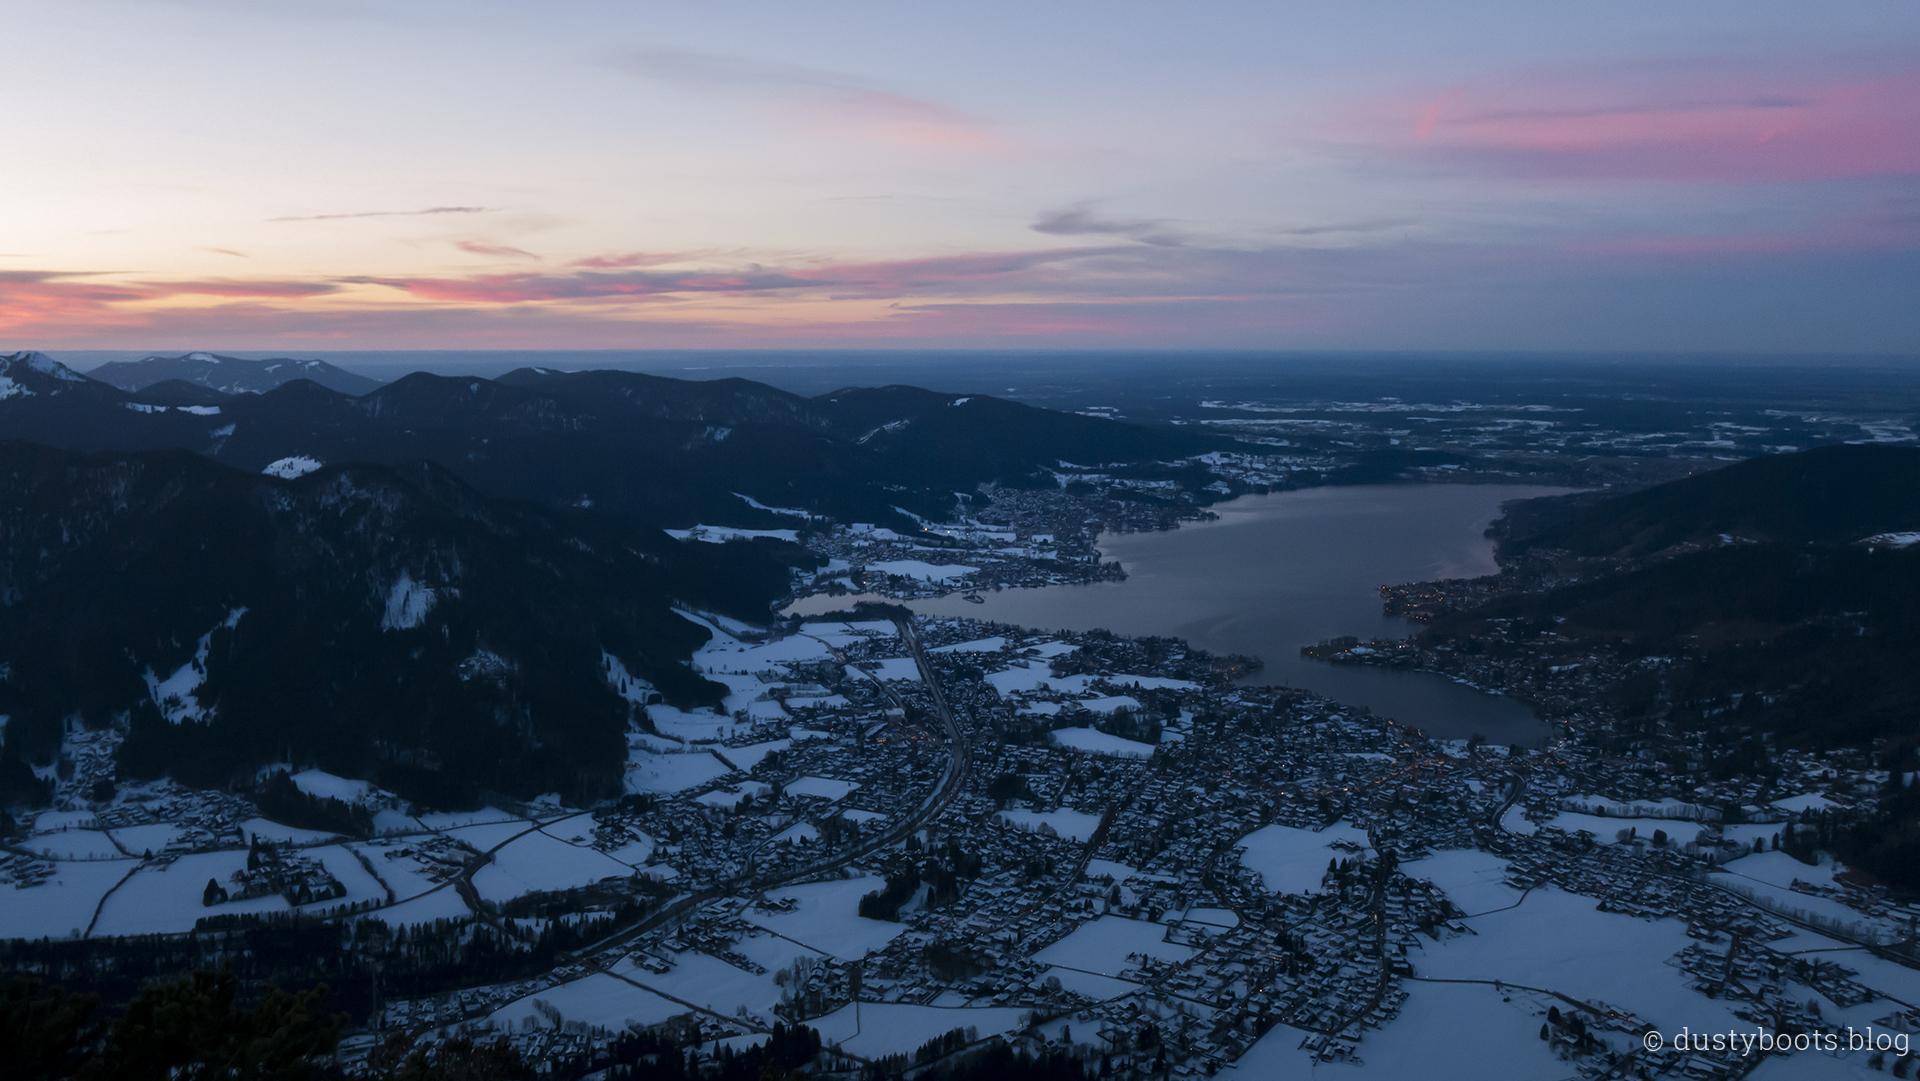 Sonnenuntergang über dem Tegernsee